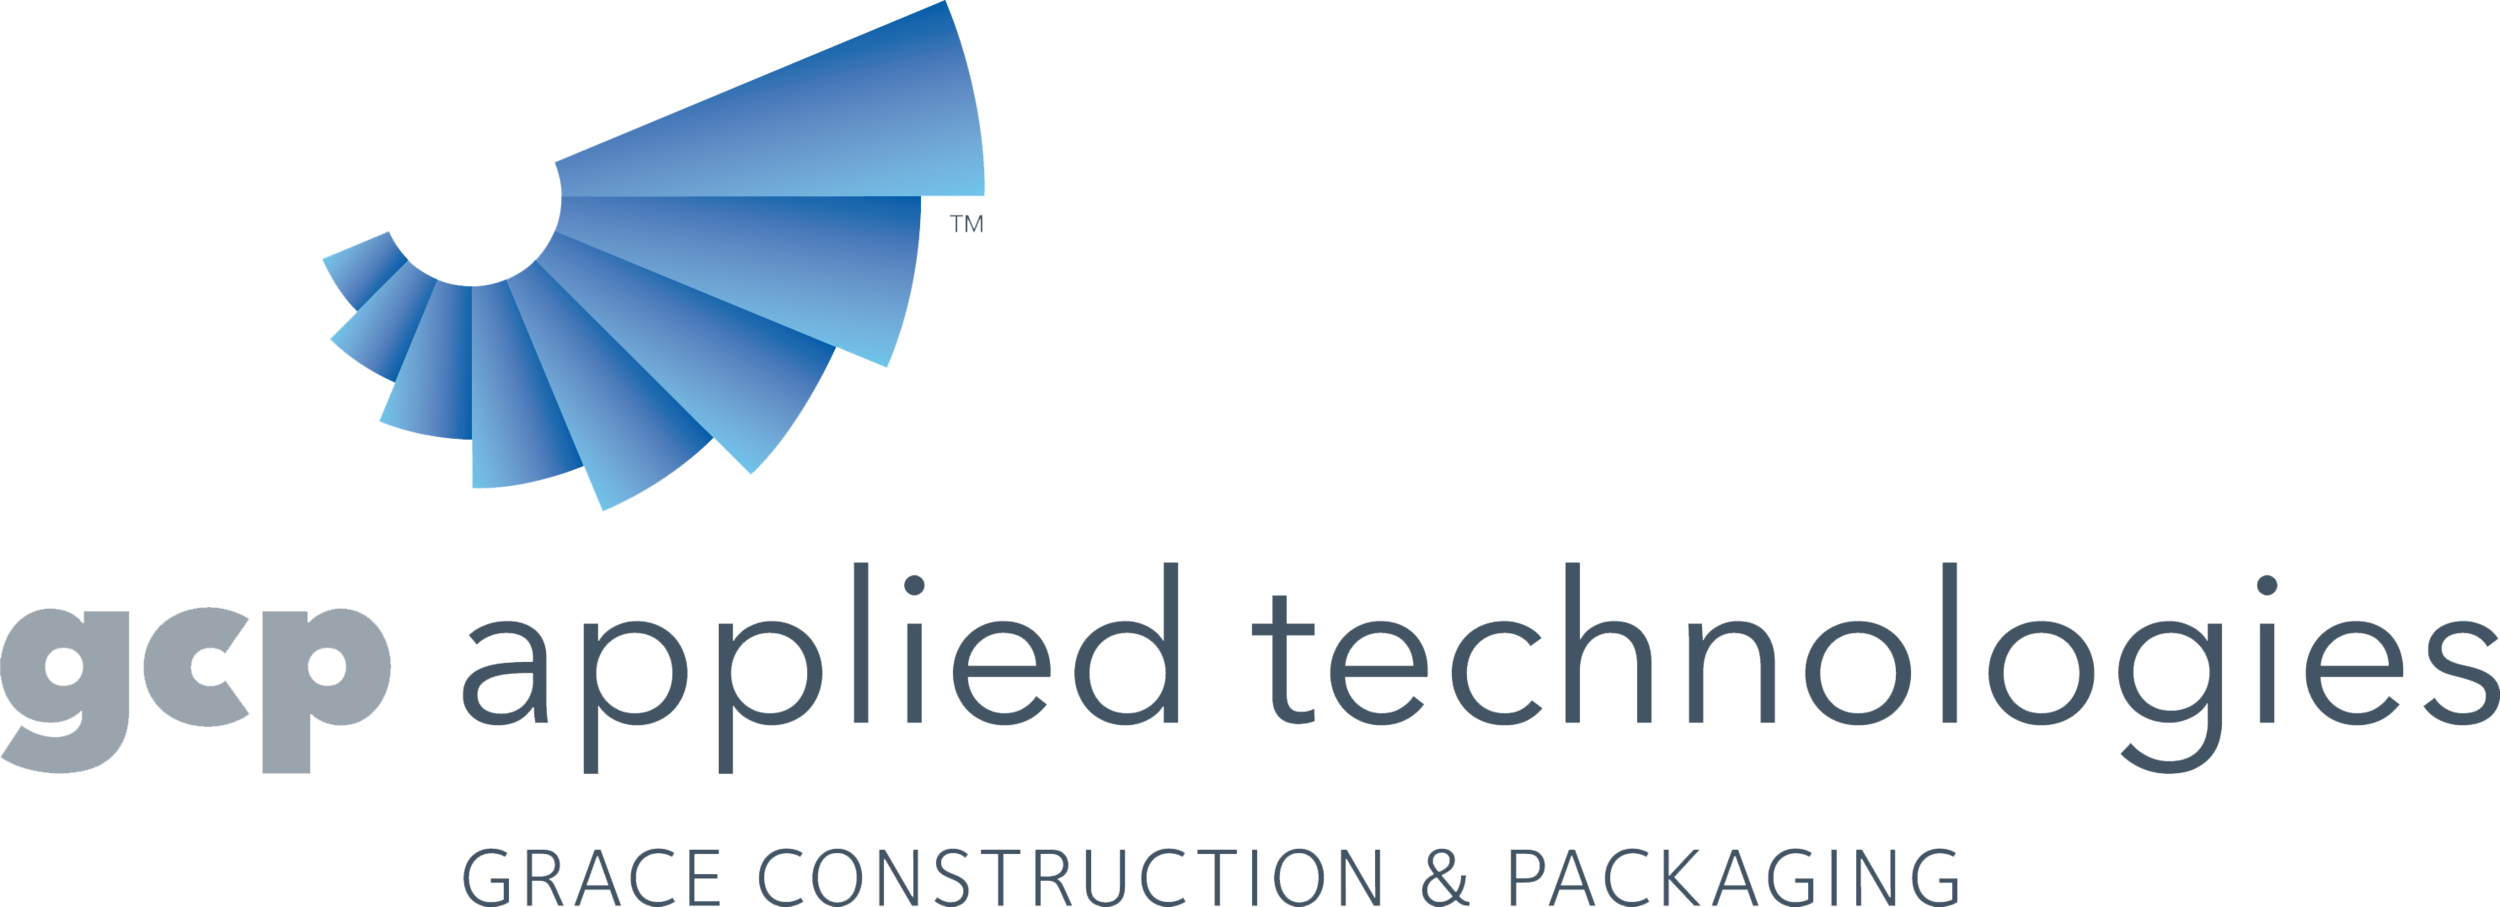 GCP_AppliedTechnologies_Logo_H.png